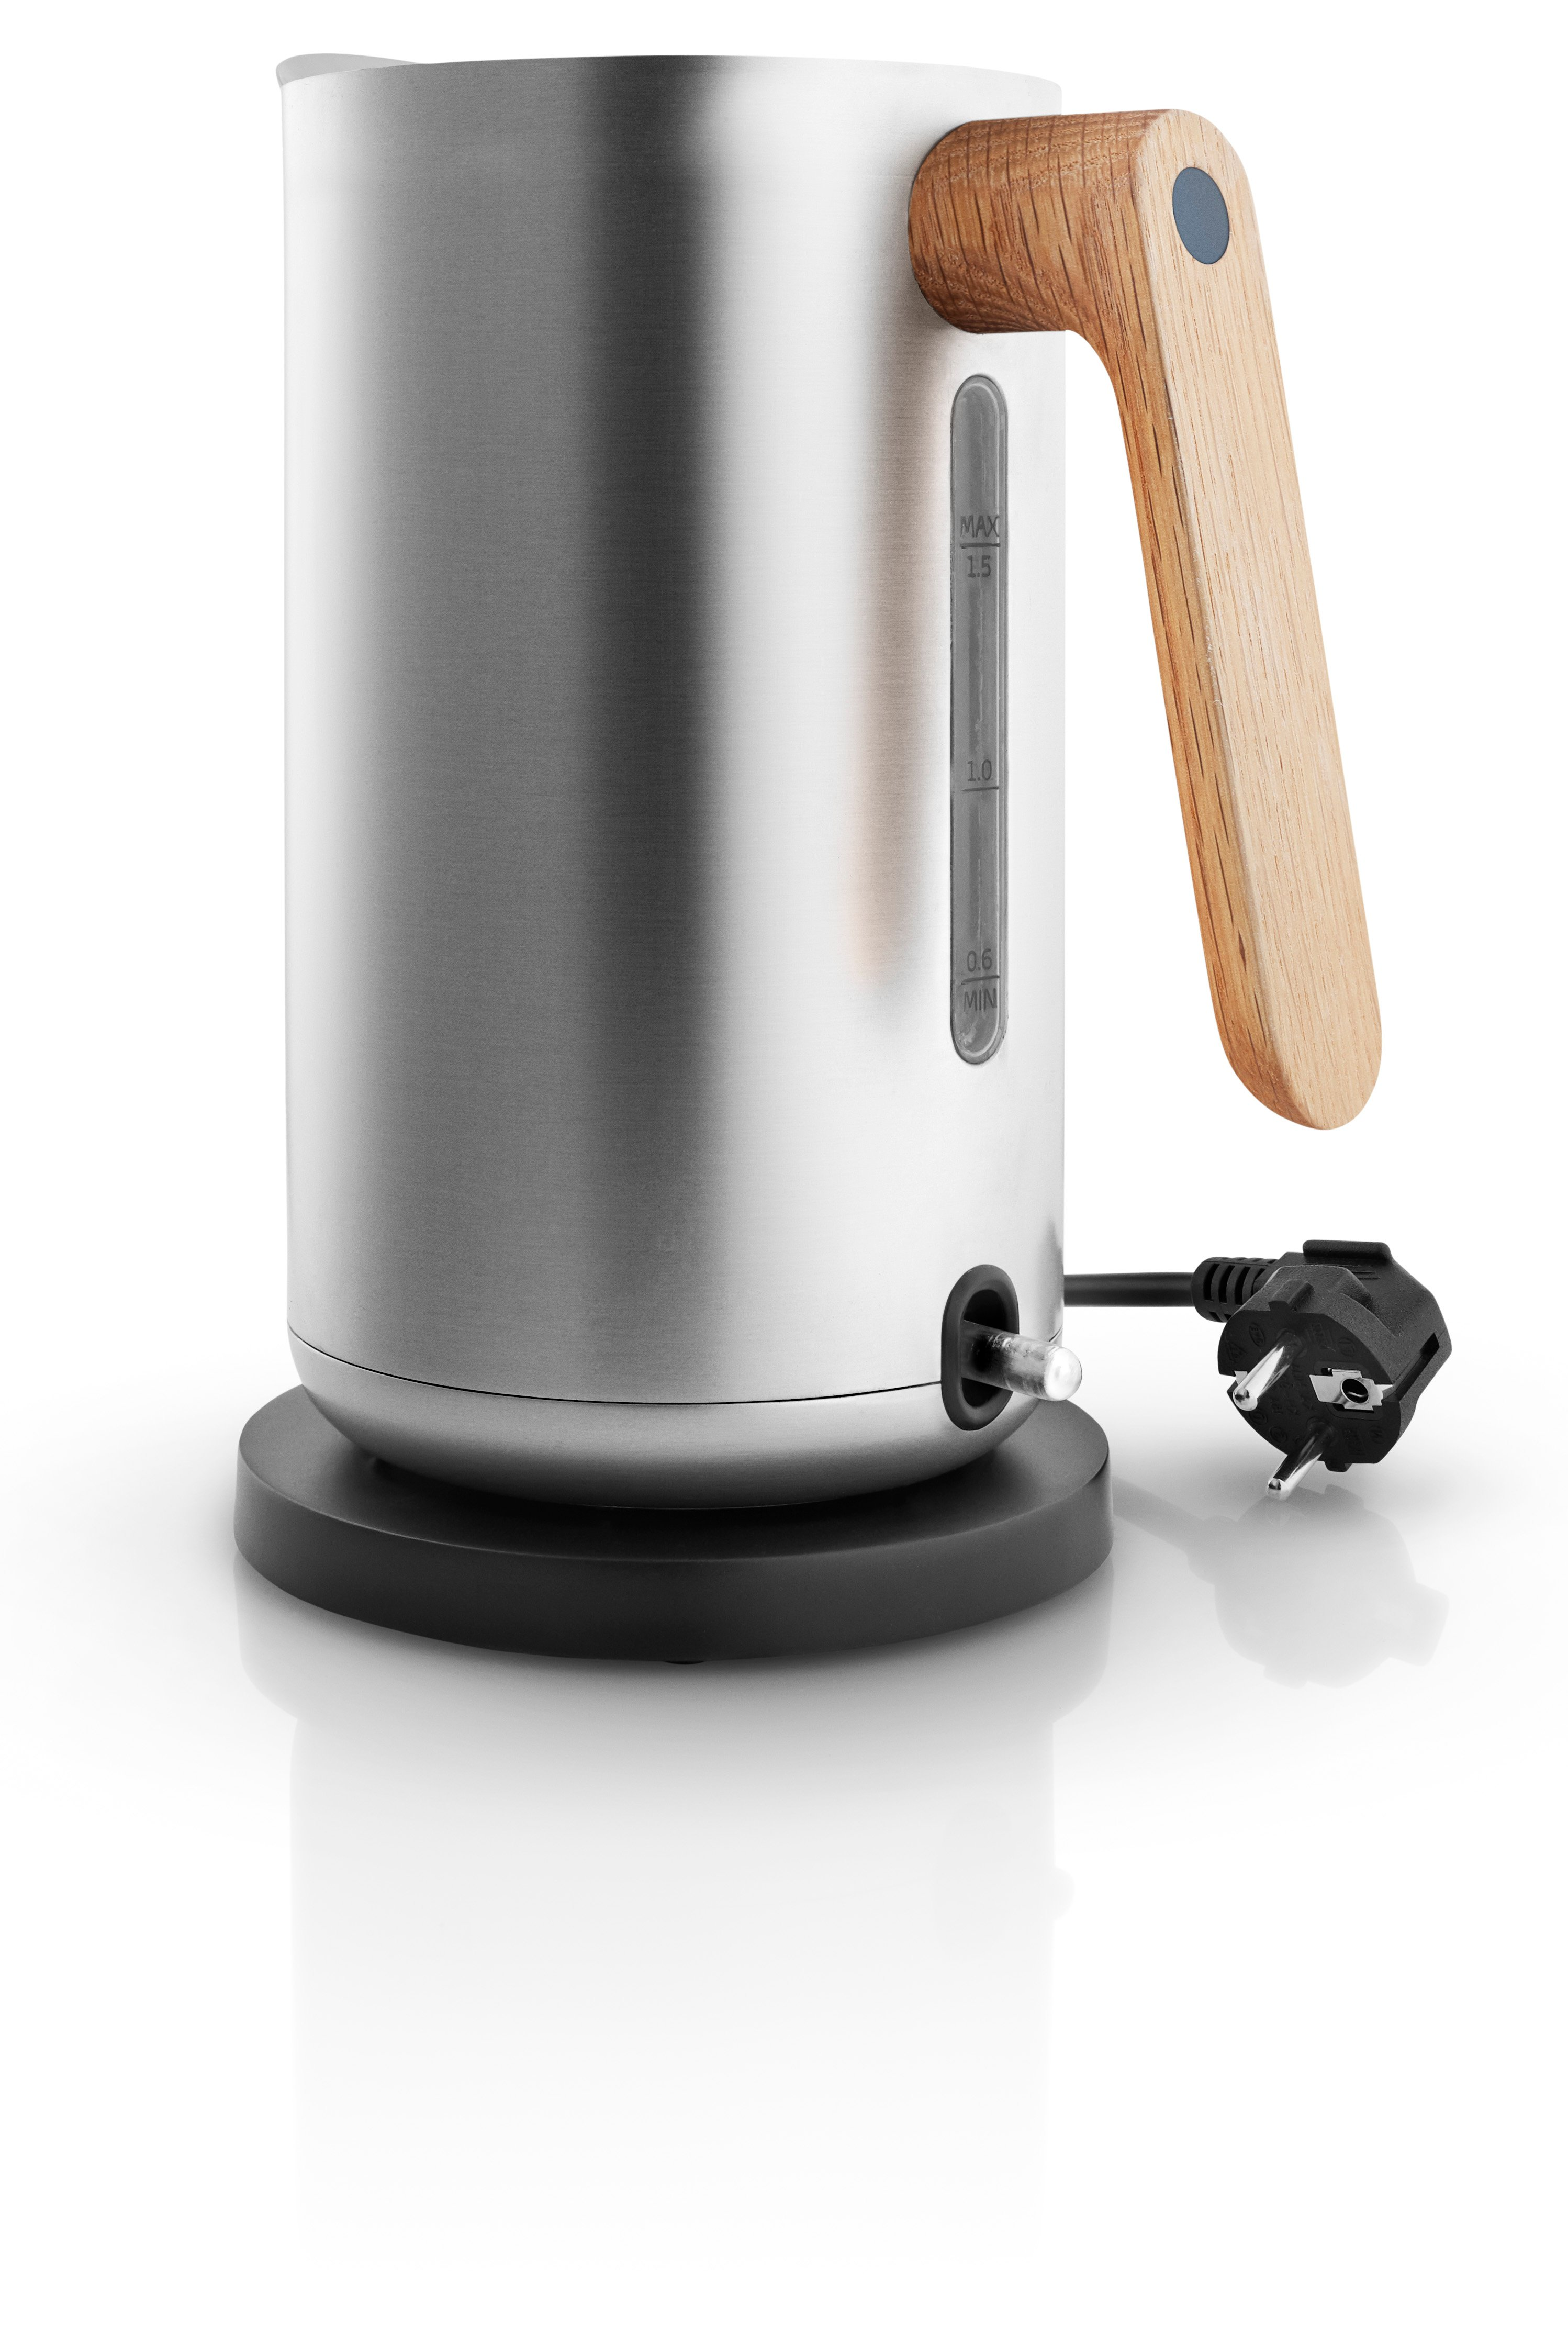 Eva Solo - Nordic Kitchen Electric Kettle (502740)